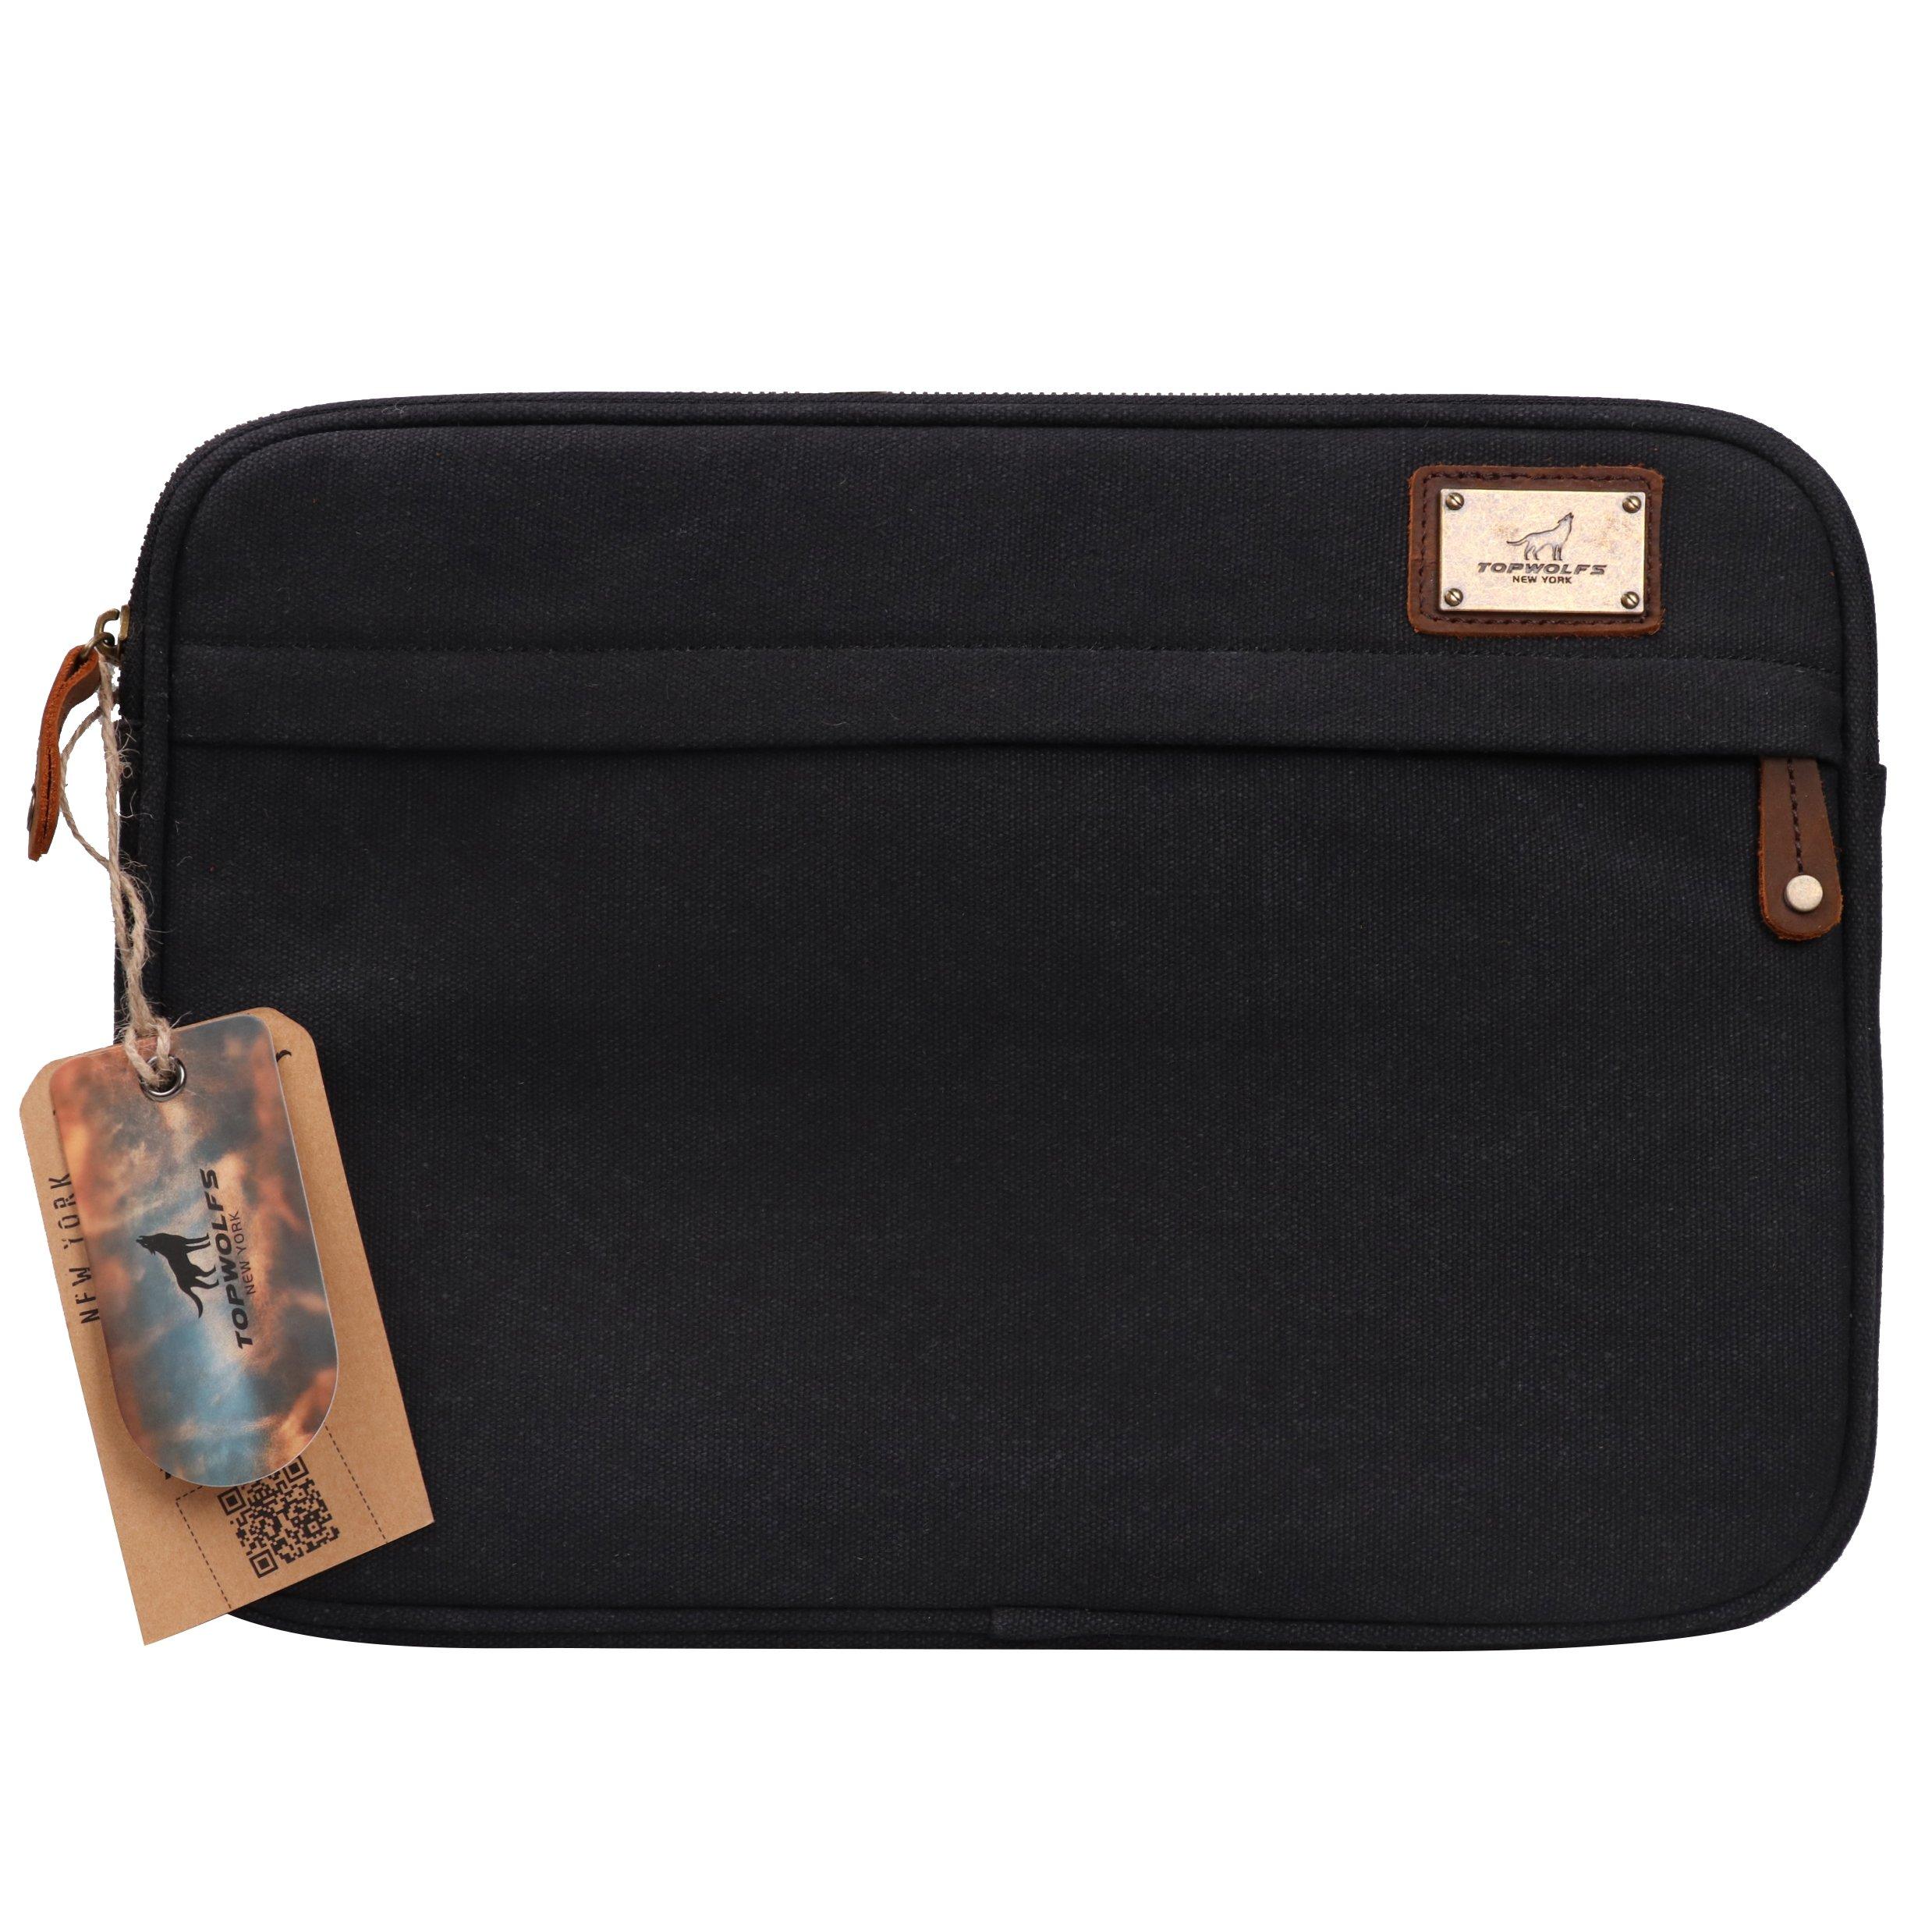 13.3'' Laptop Case TOPWOLFS Canvas Laptop Sleeve Shockproof Vintage Briefcase Computer Notebook Case Carry On Bag Hand Bag